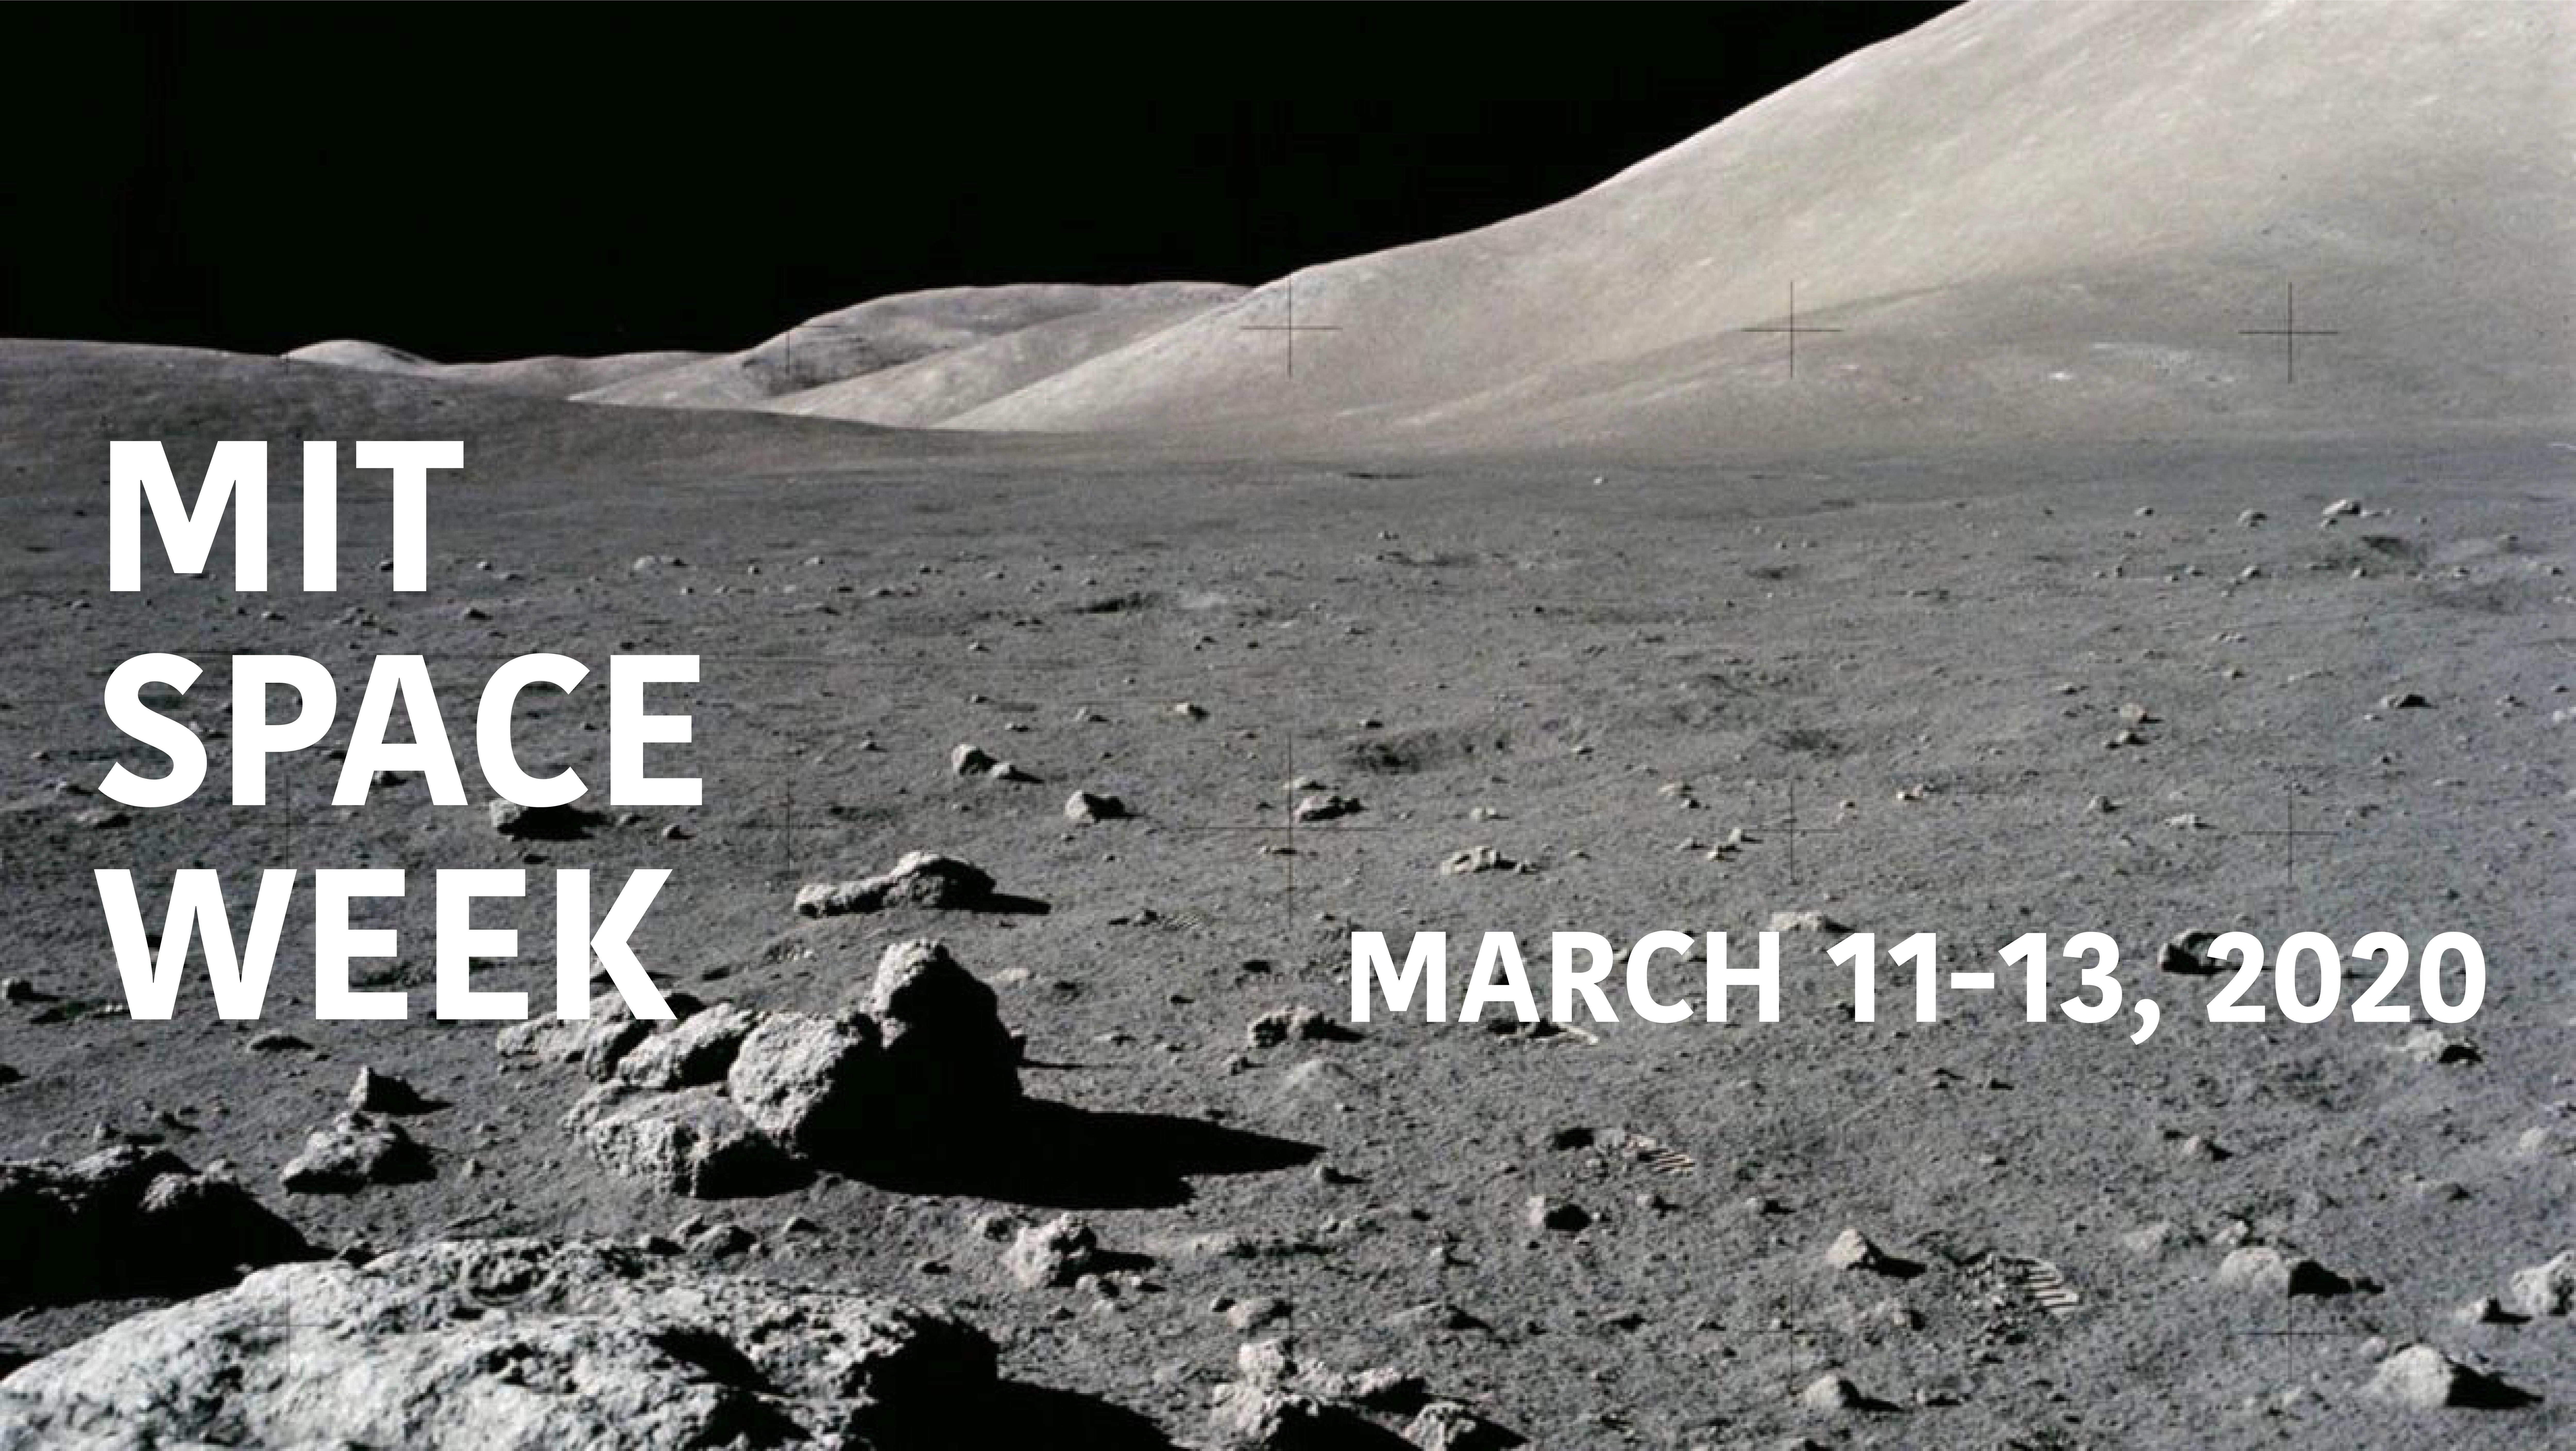 spaceweek logo